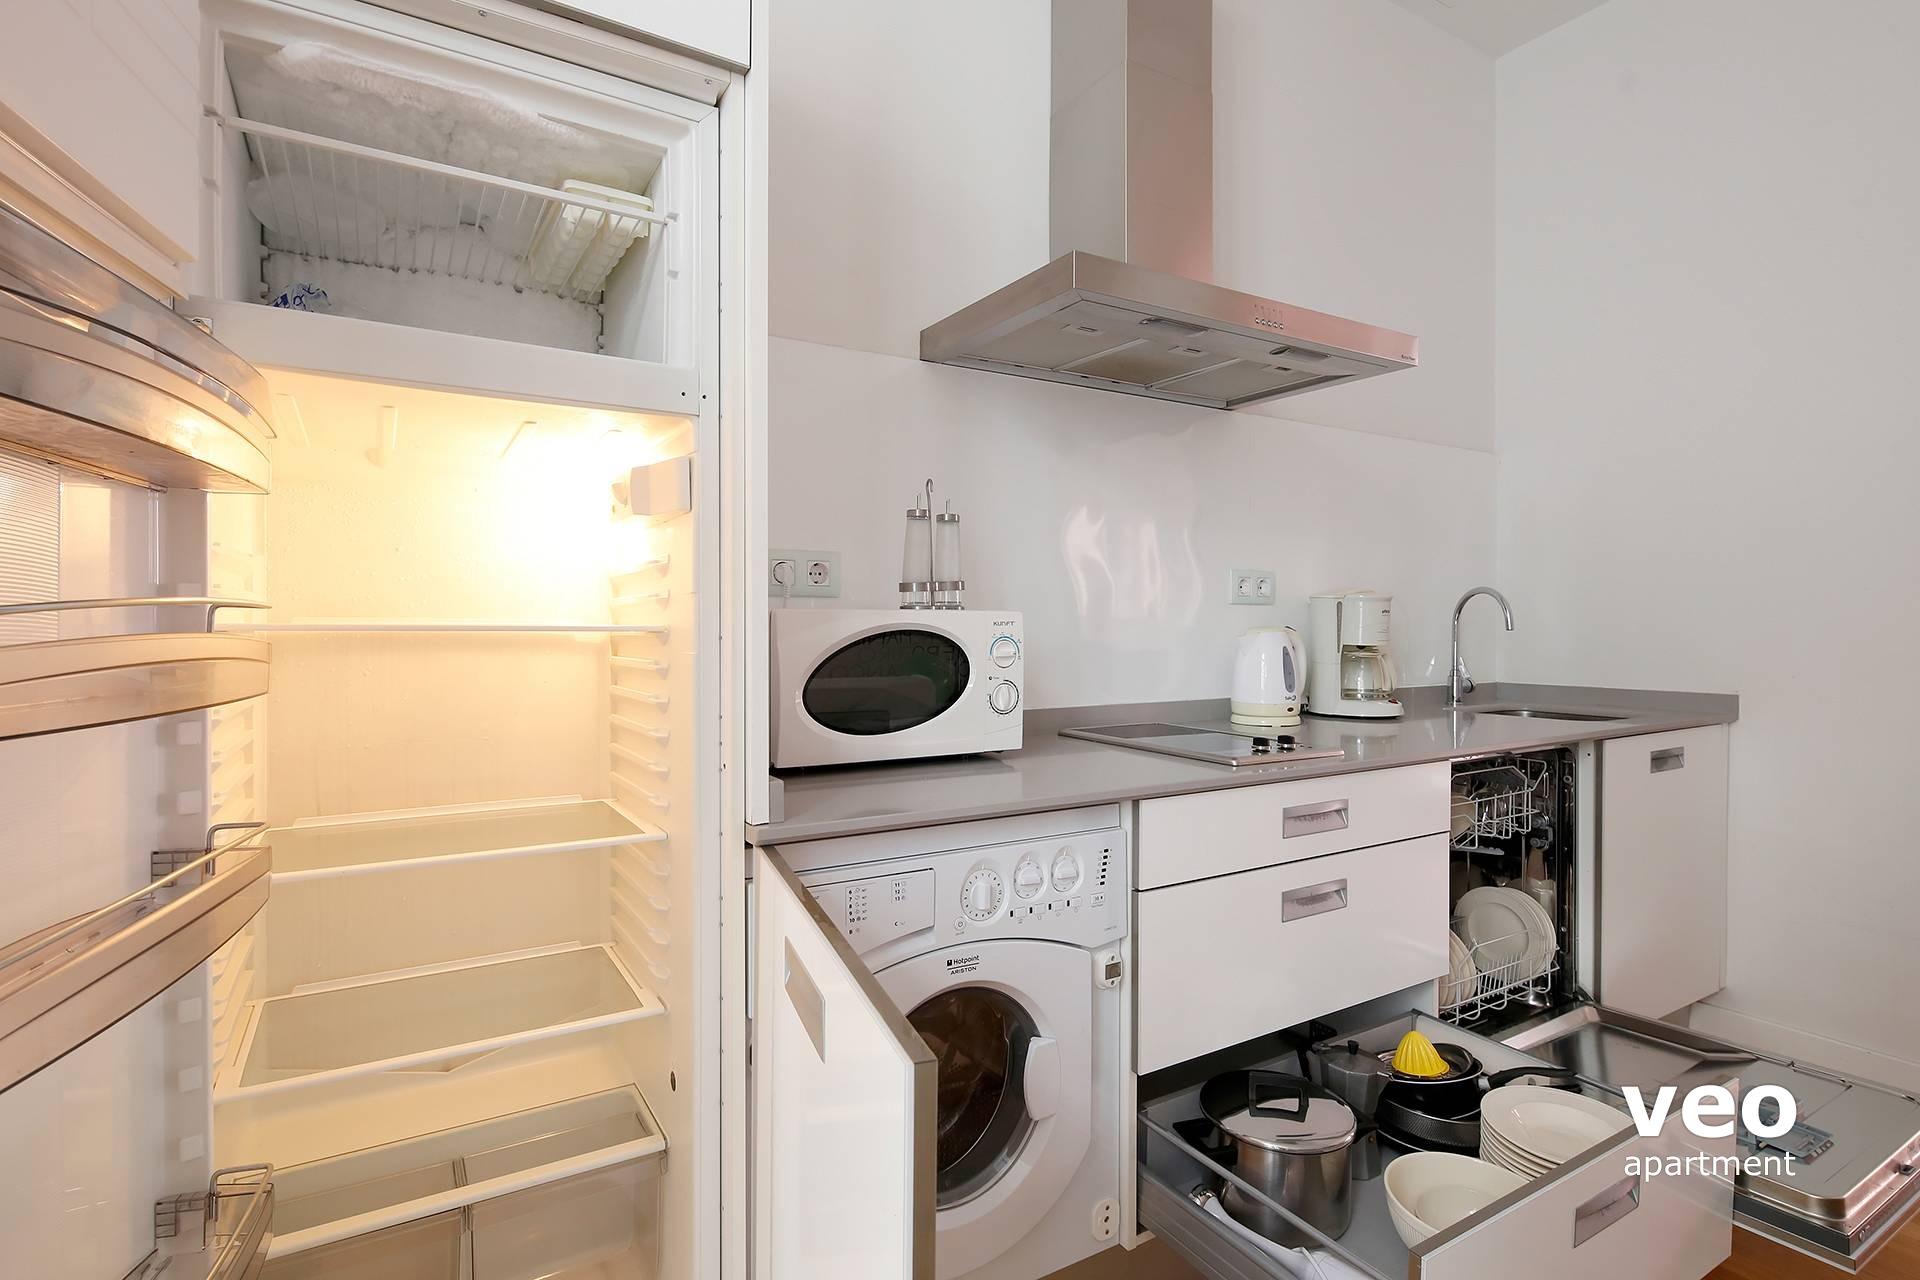 Apartment mieten Teodosio Strasse Sevilla Spanien | Teodosio 3 ...